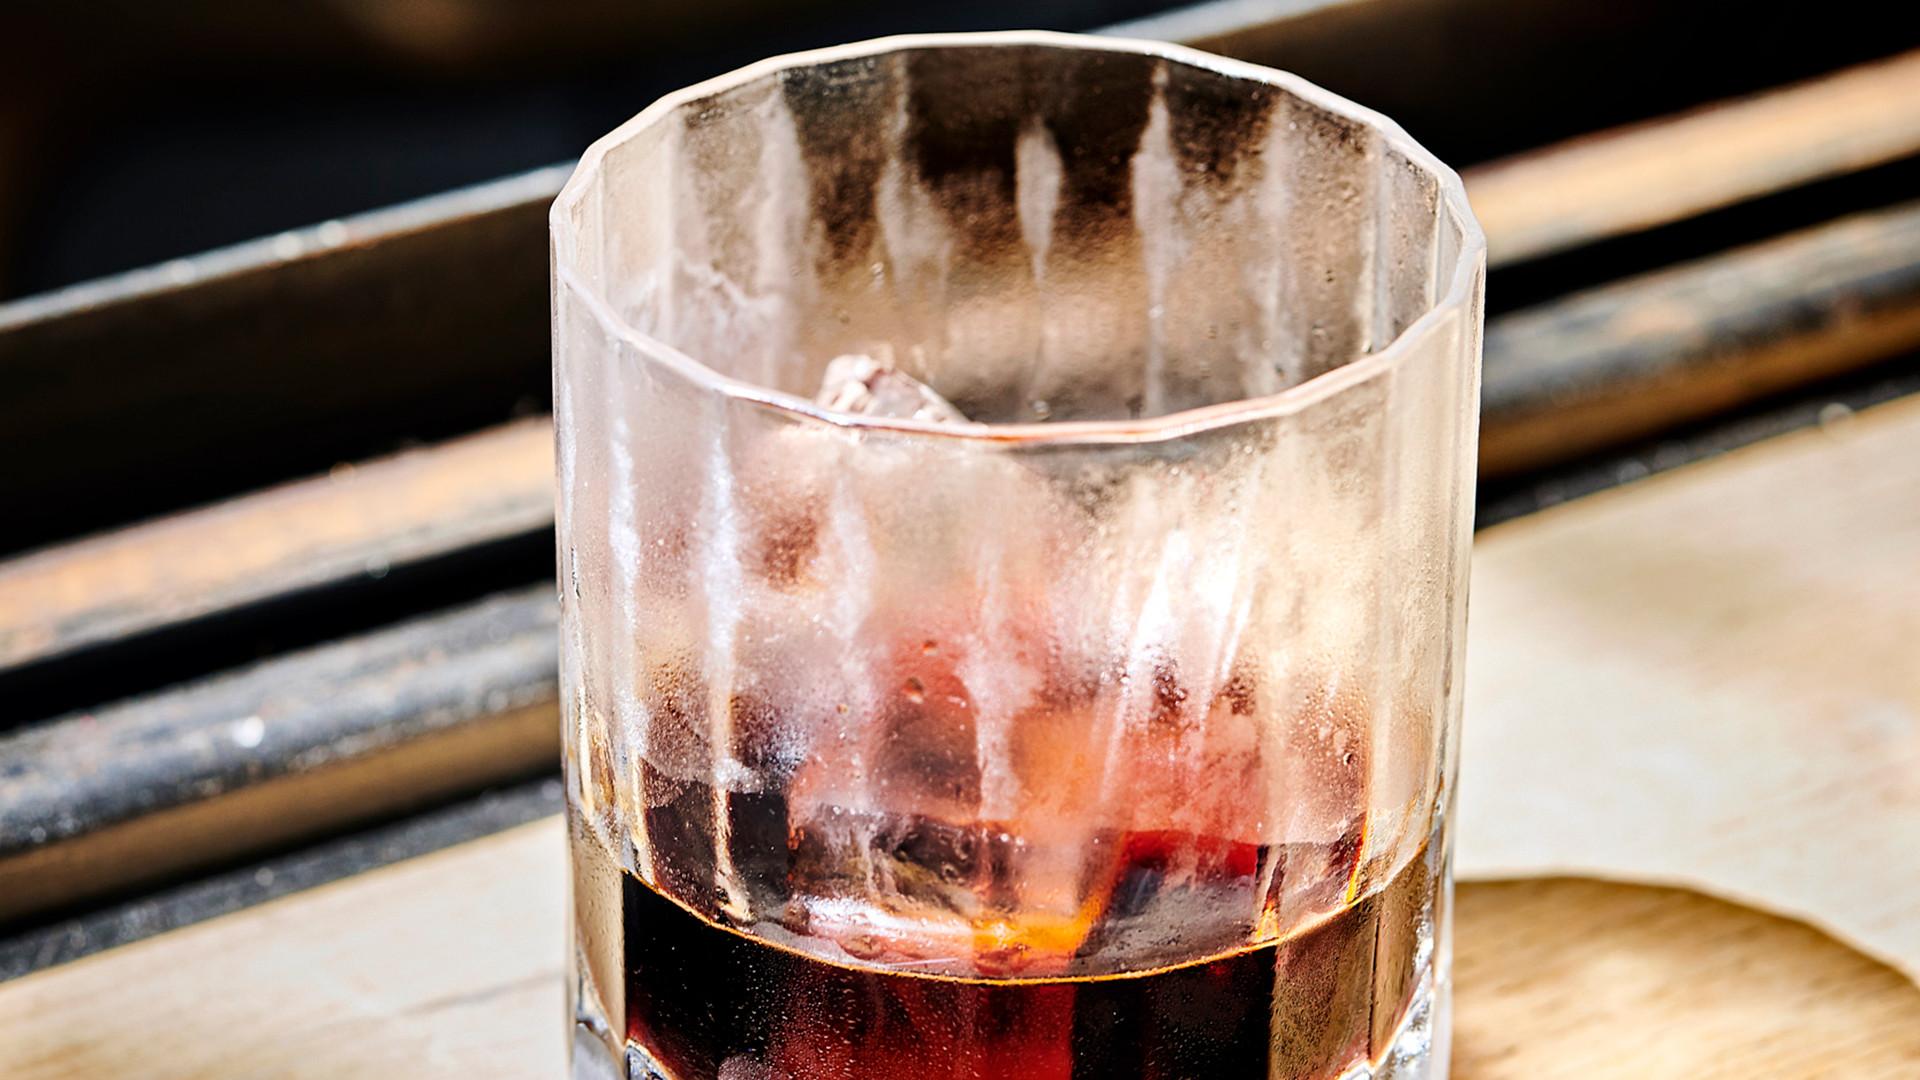 Drink at 10 Heddon Street in Mayfair